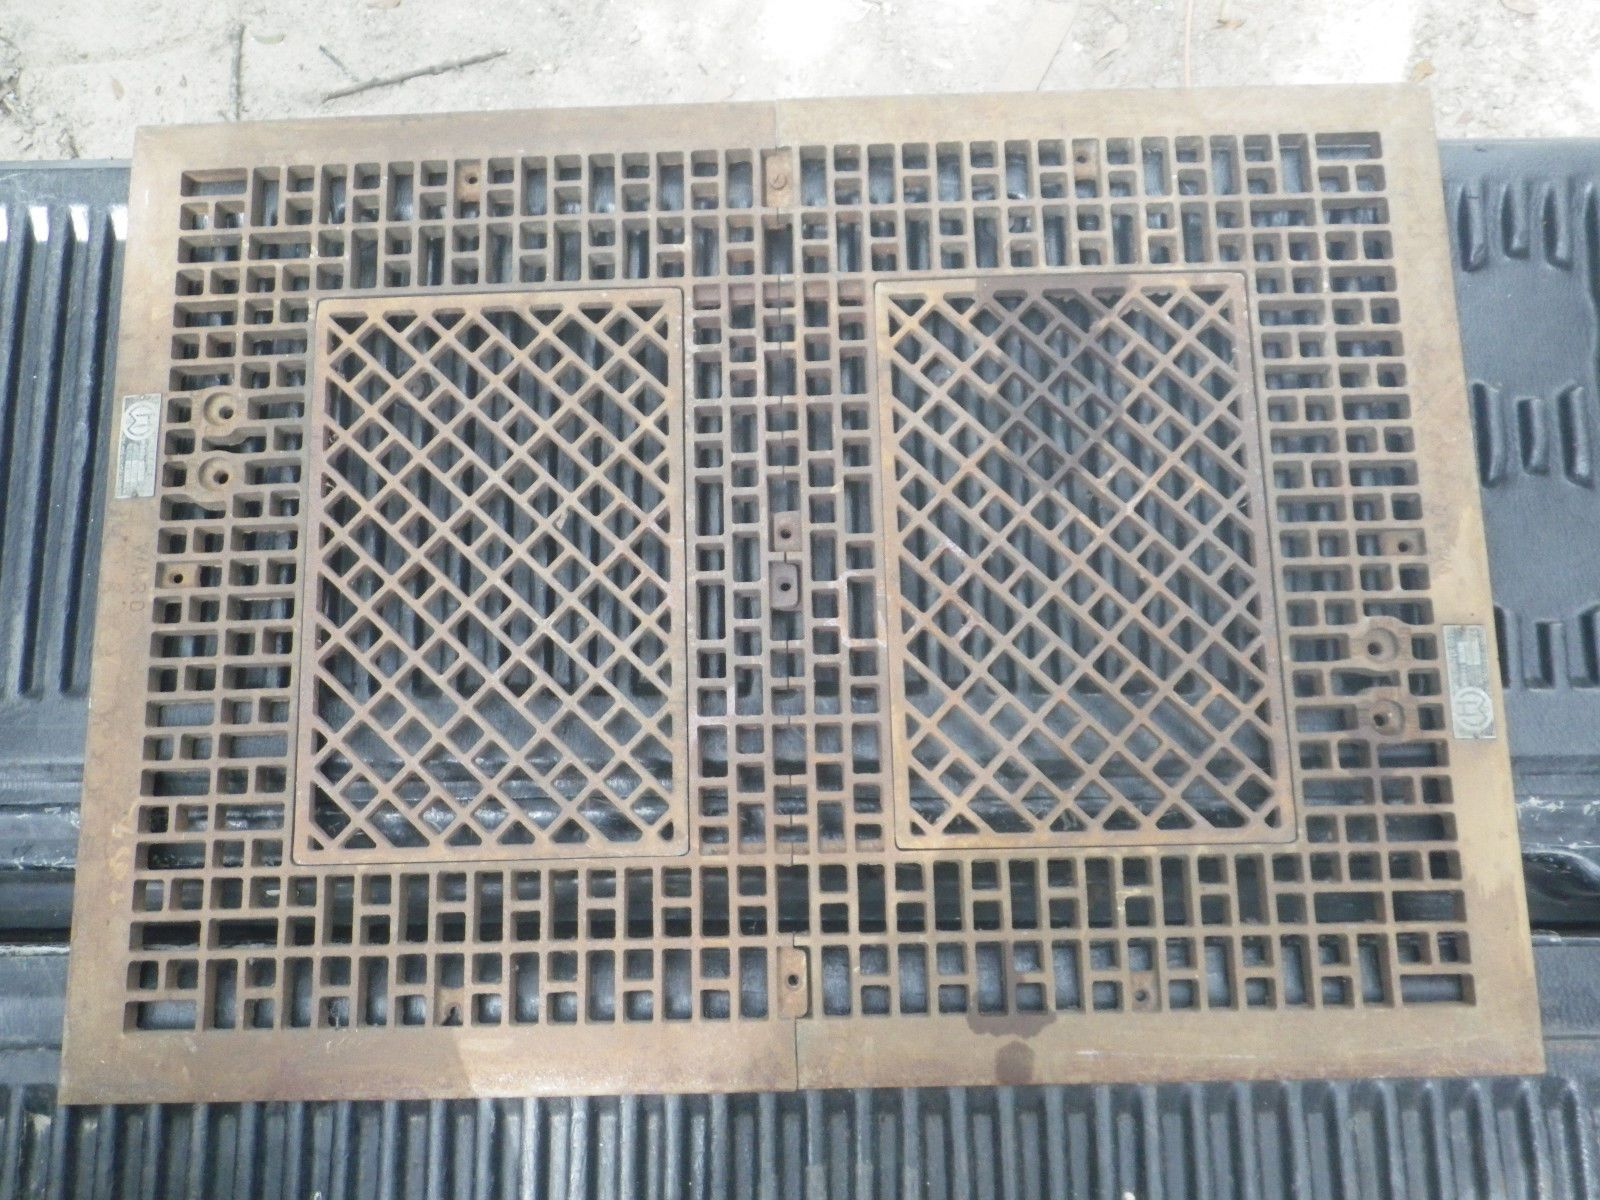 Best 25 floor furnace ideas on pinterest newton shoes tiny antique vintage ward cast iron floor furnace grate 38 3 4 x 28 3 8 dailygadgetfo Choice Image